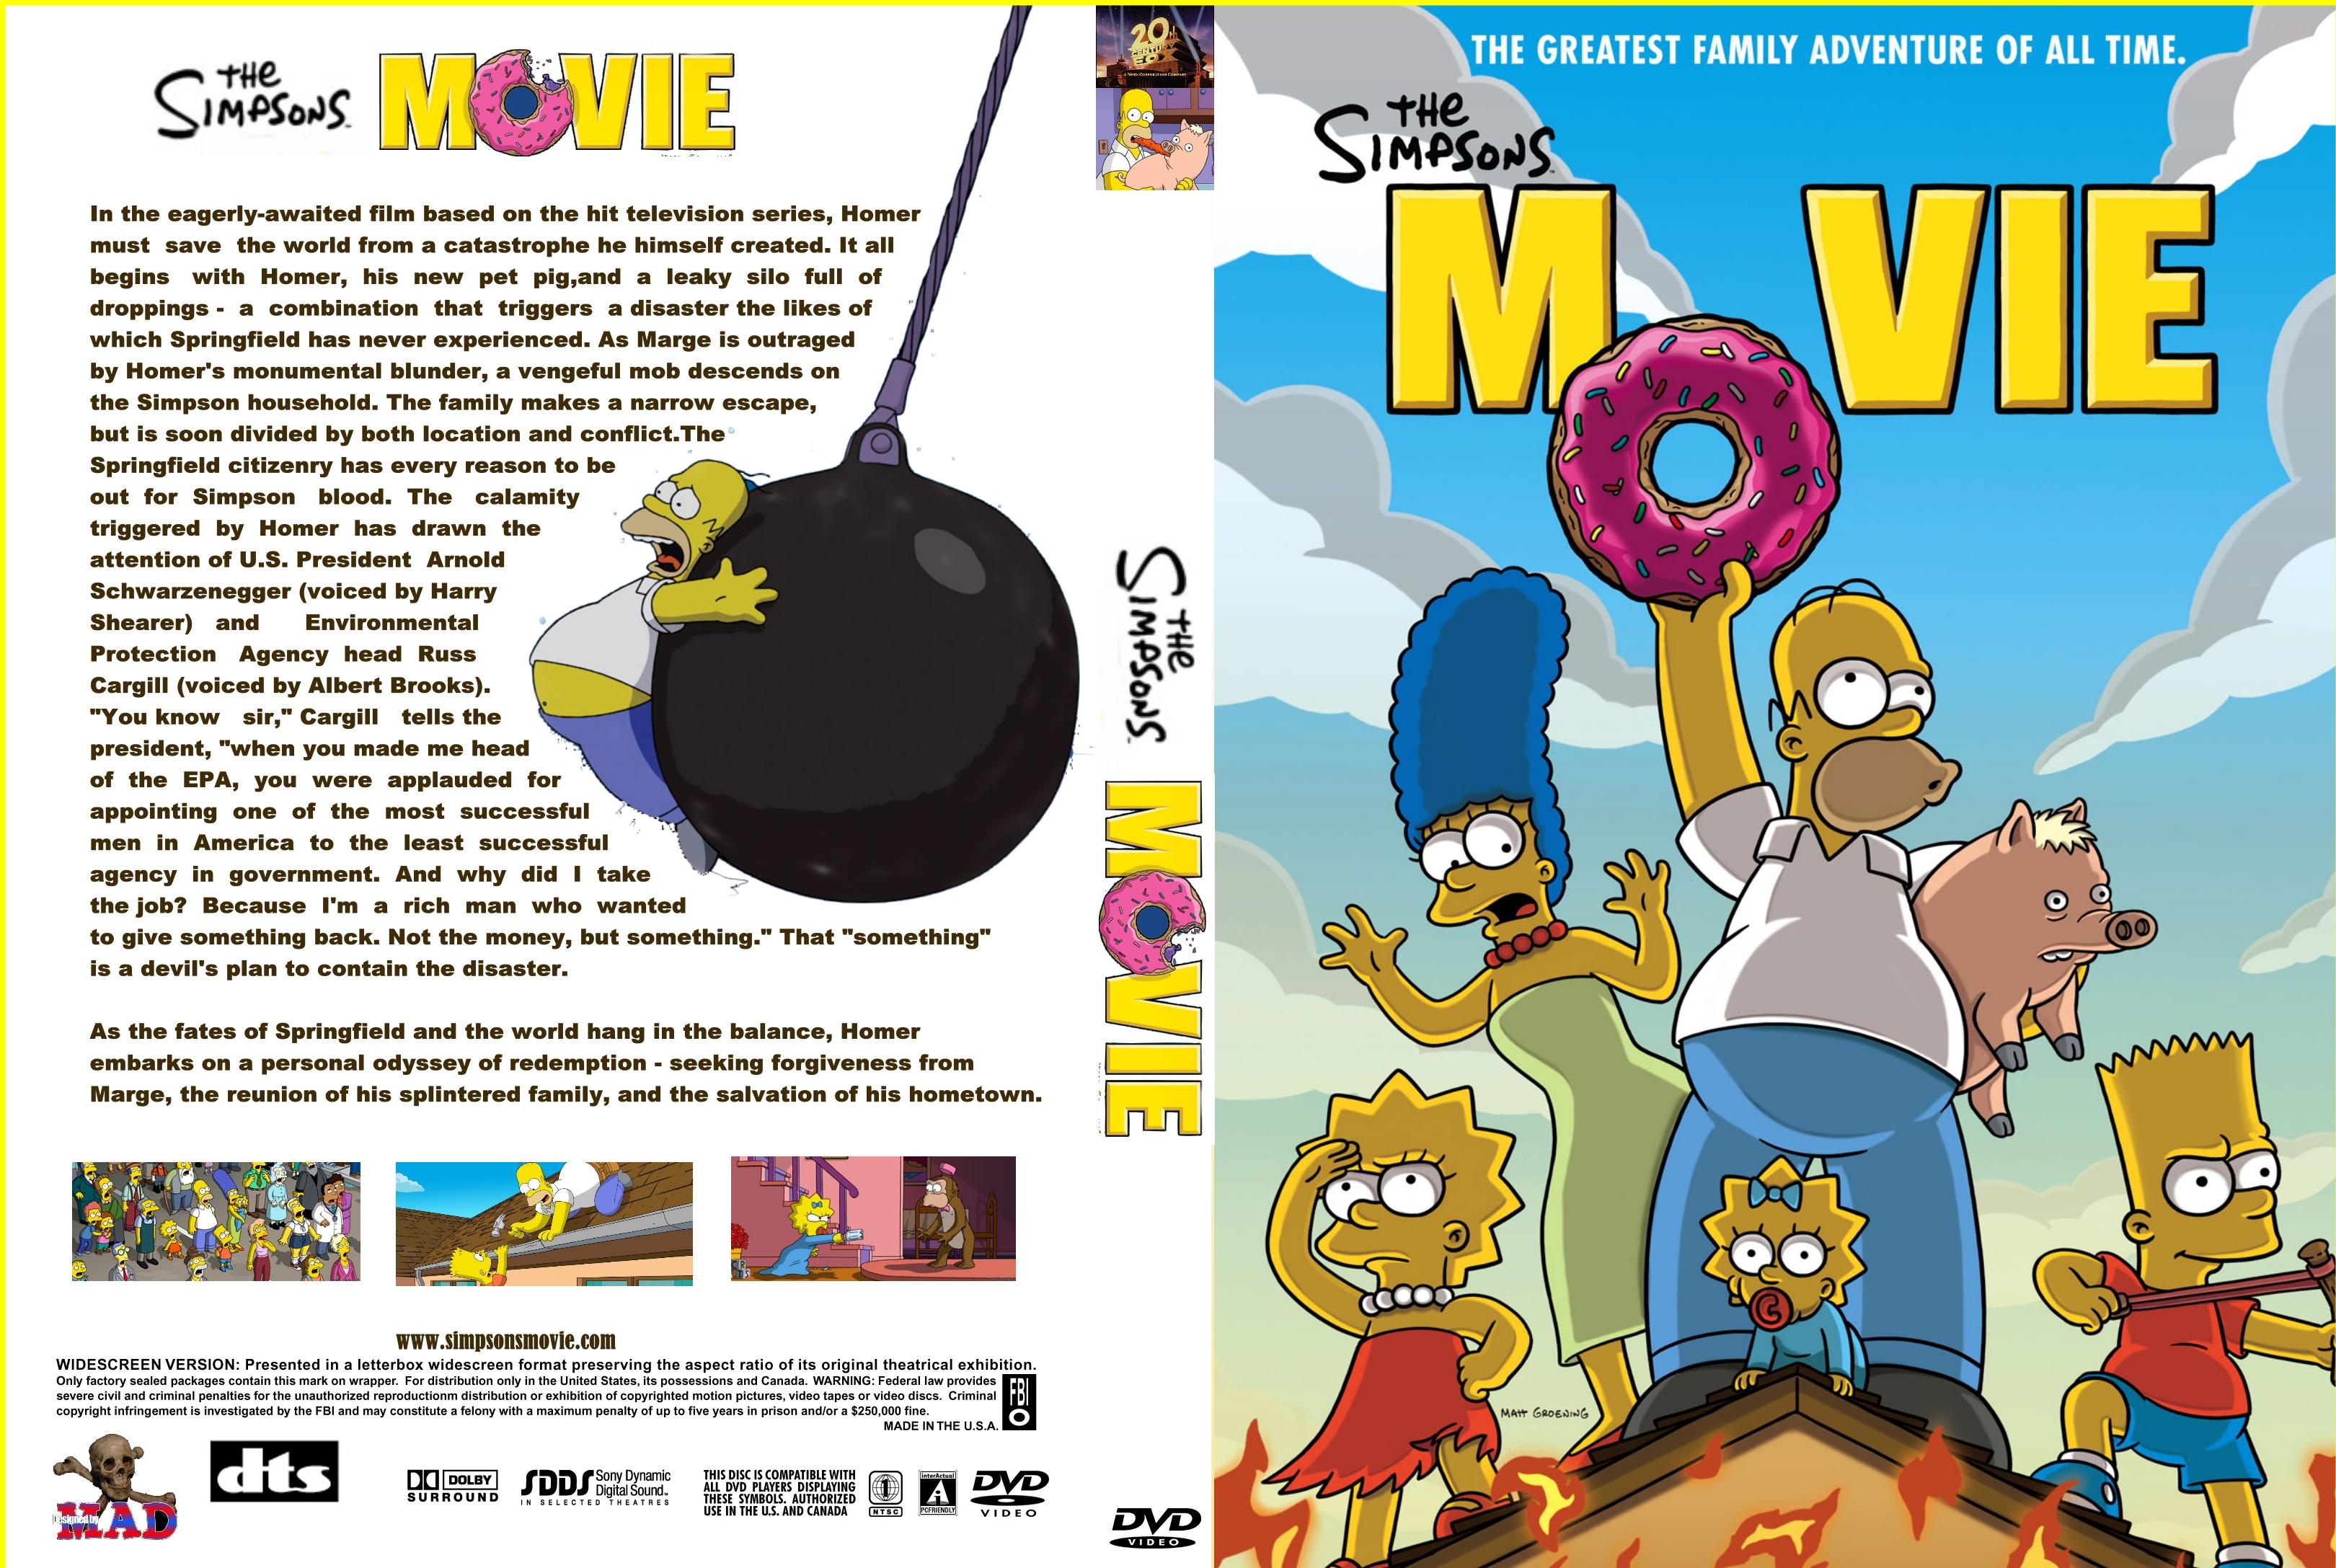 Covers Box Sk Simpsons Movie High Quality Dvd Blueray Movie